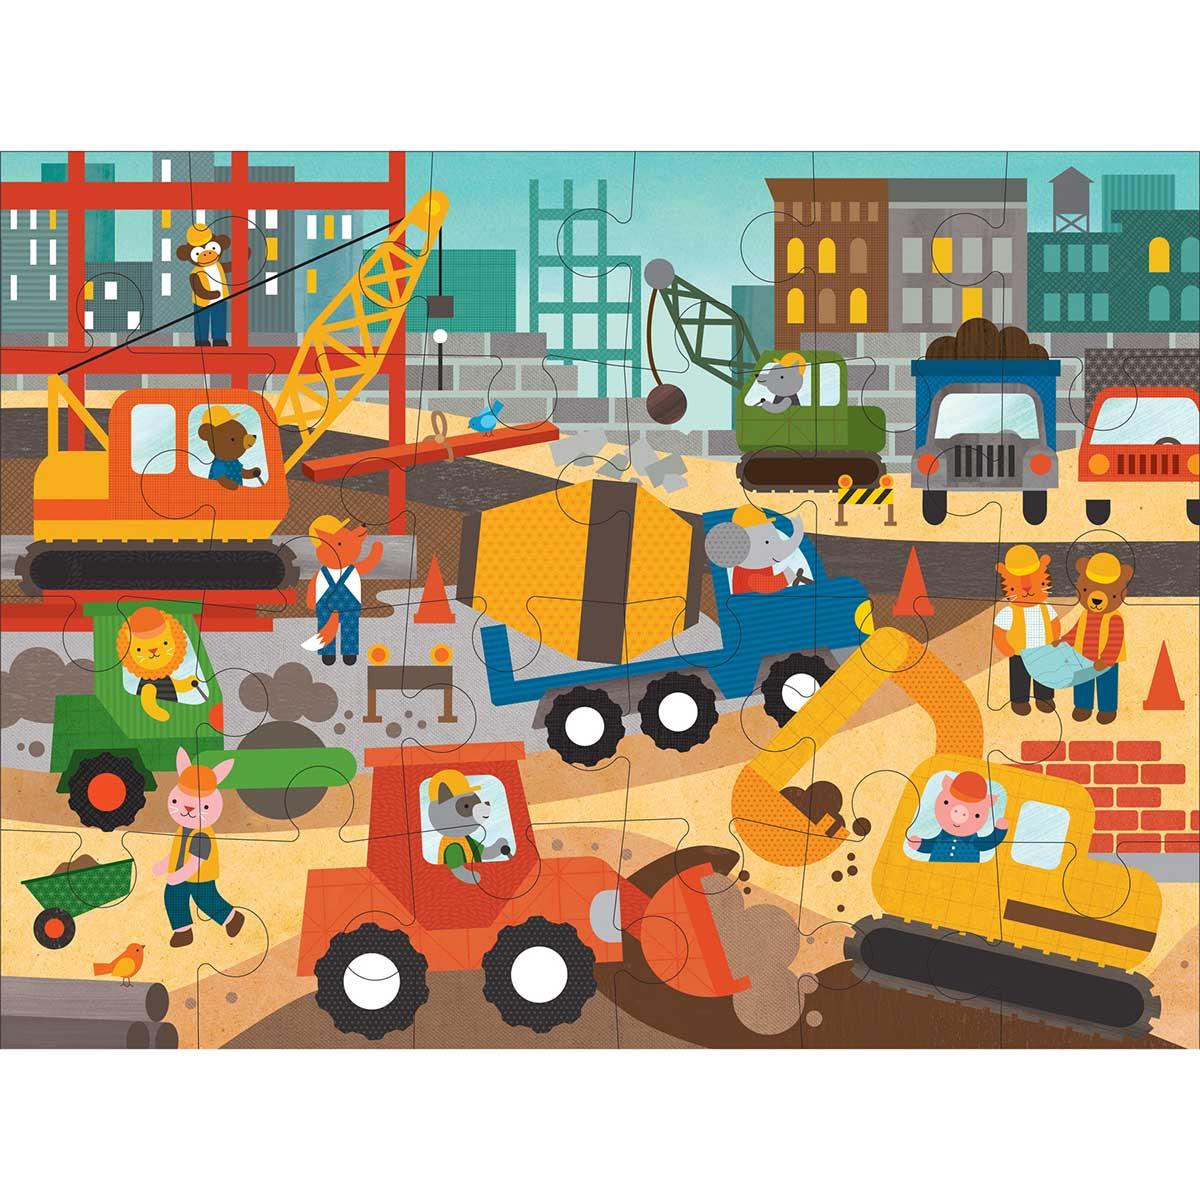 Construction Site Construction Jigsaw Puzzle